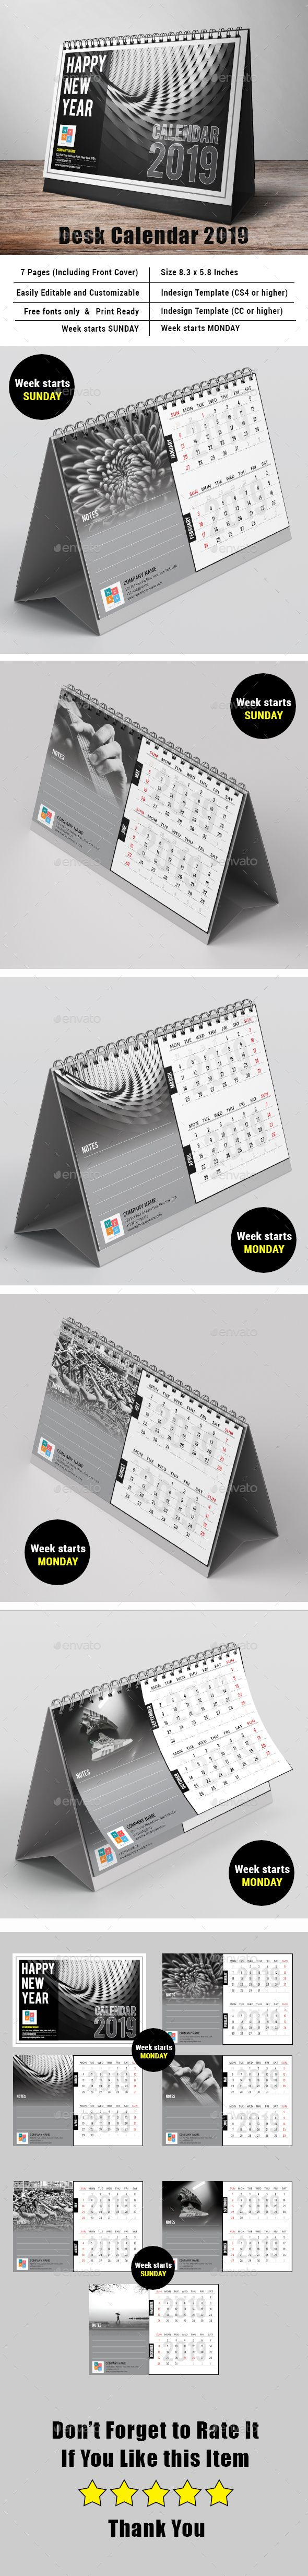 Desk Calendar 2019 Desk calendars, Calendar, Desk